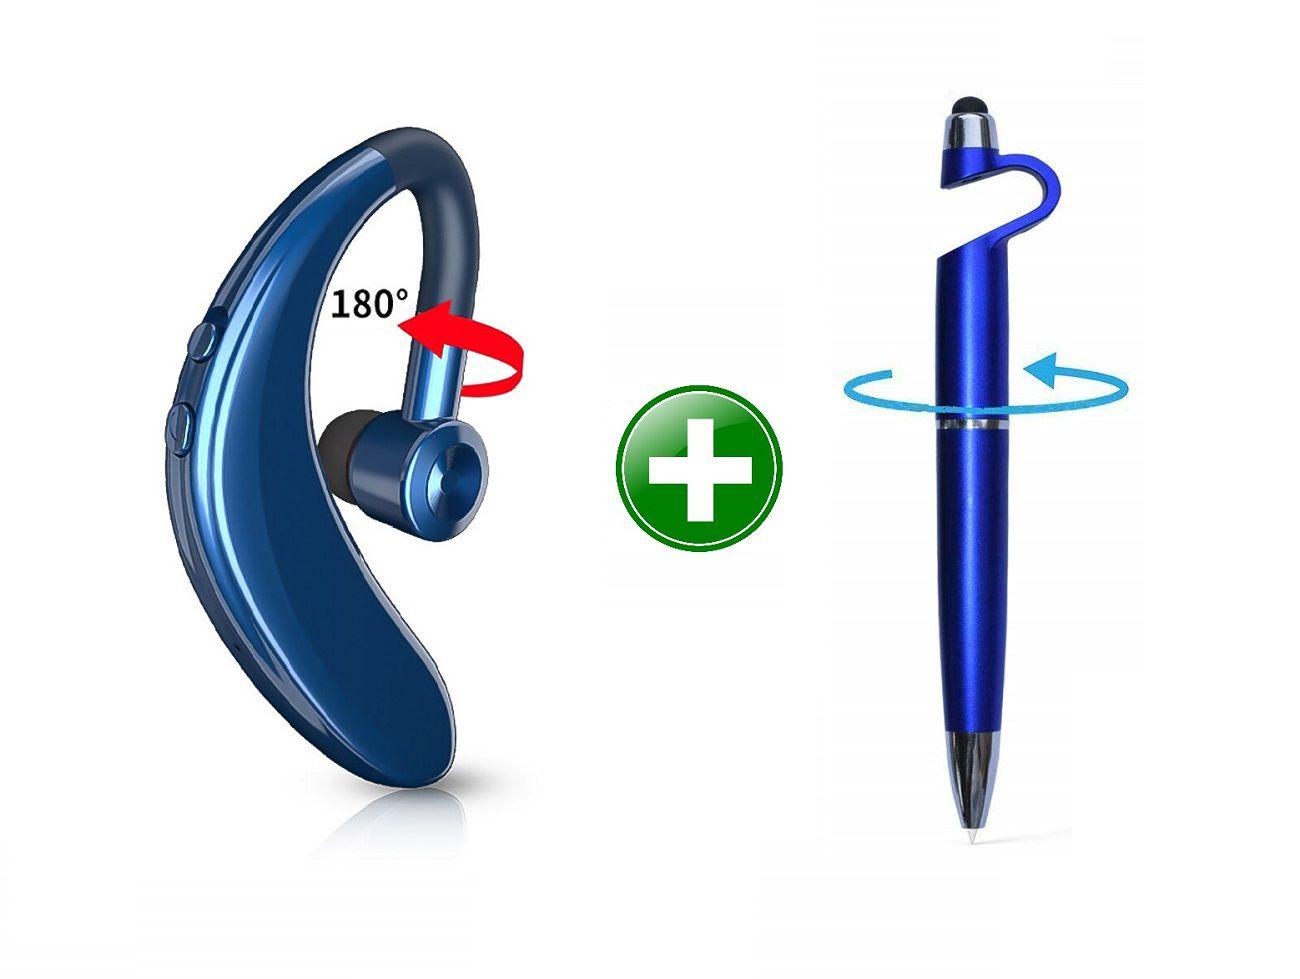 STONX S9 Wireless Handsfree v5.0 Bluetooth Headset - Blue (Free Pen mobile holder )